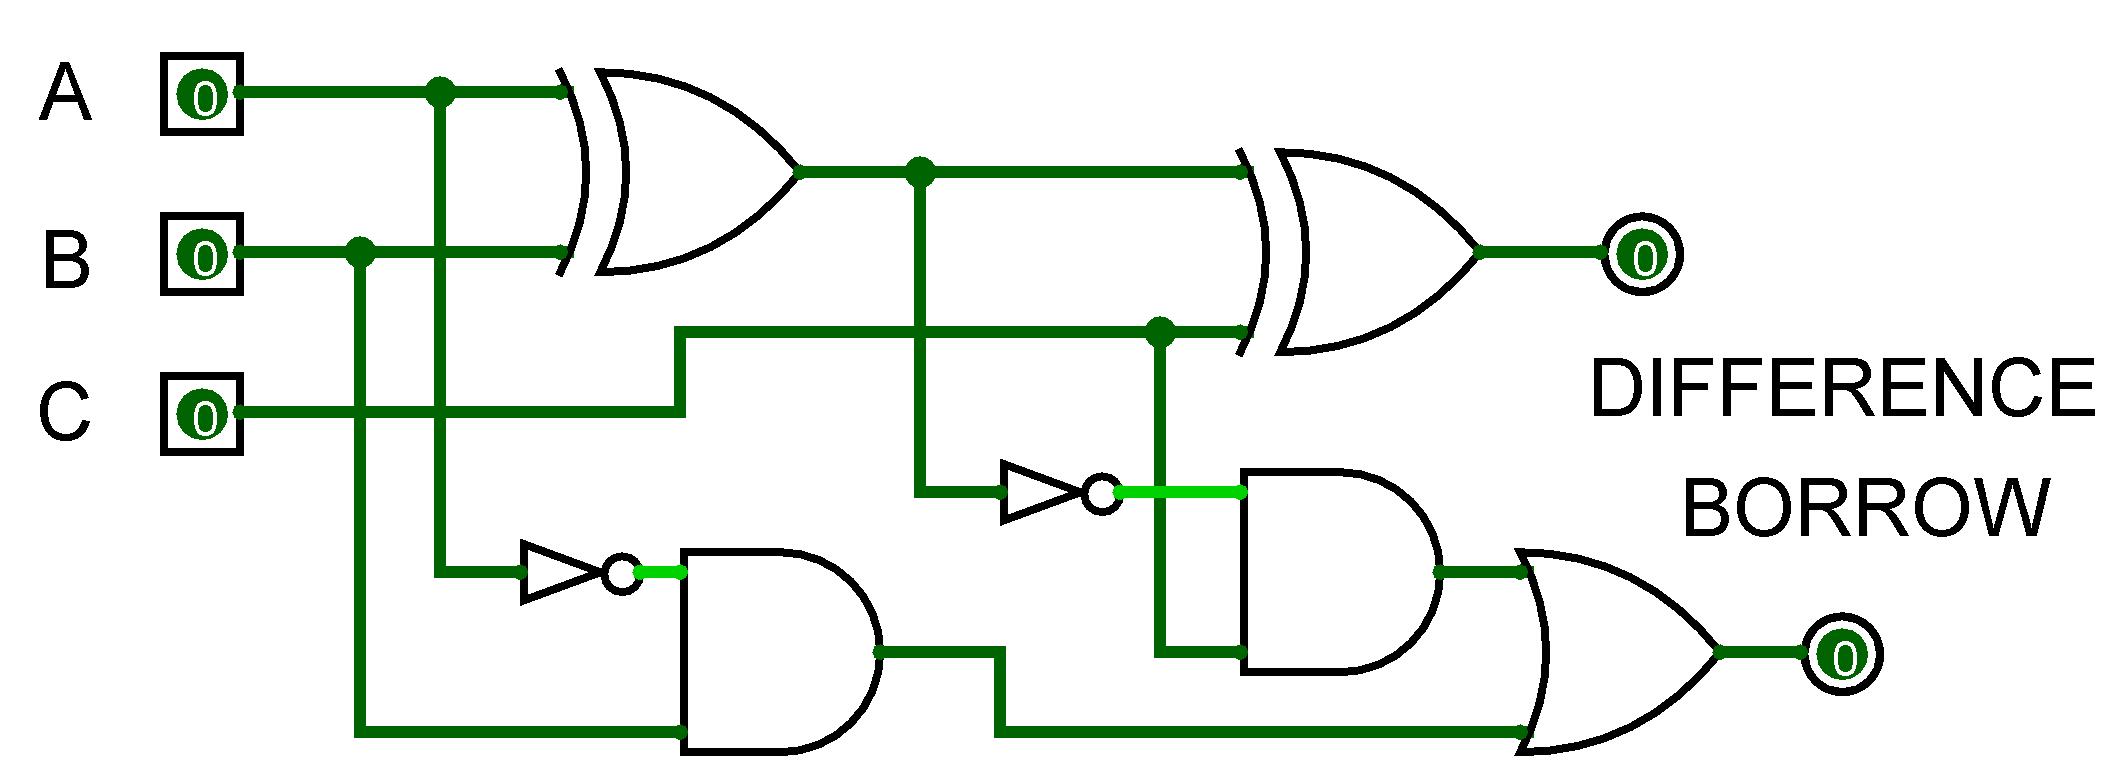 Full Adder Using Nand Logic Diagram